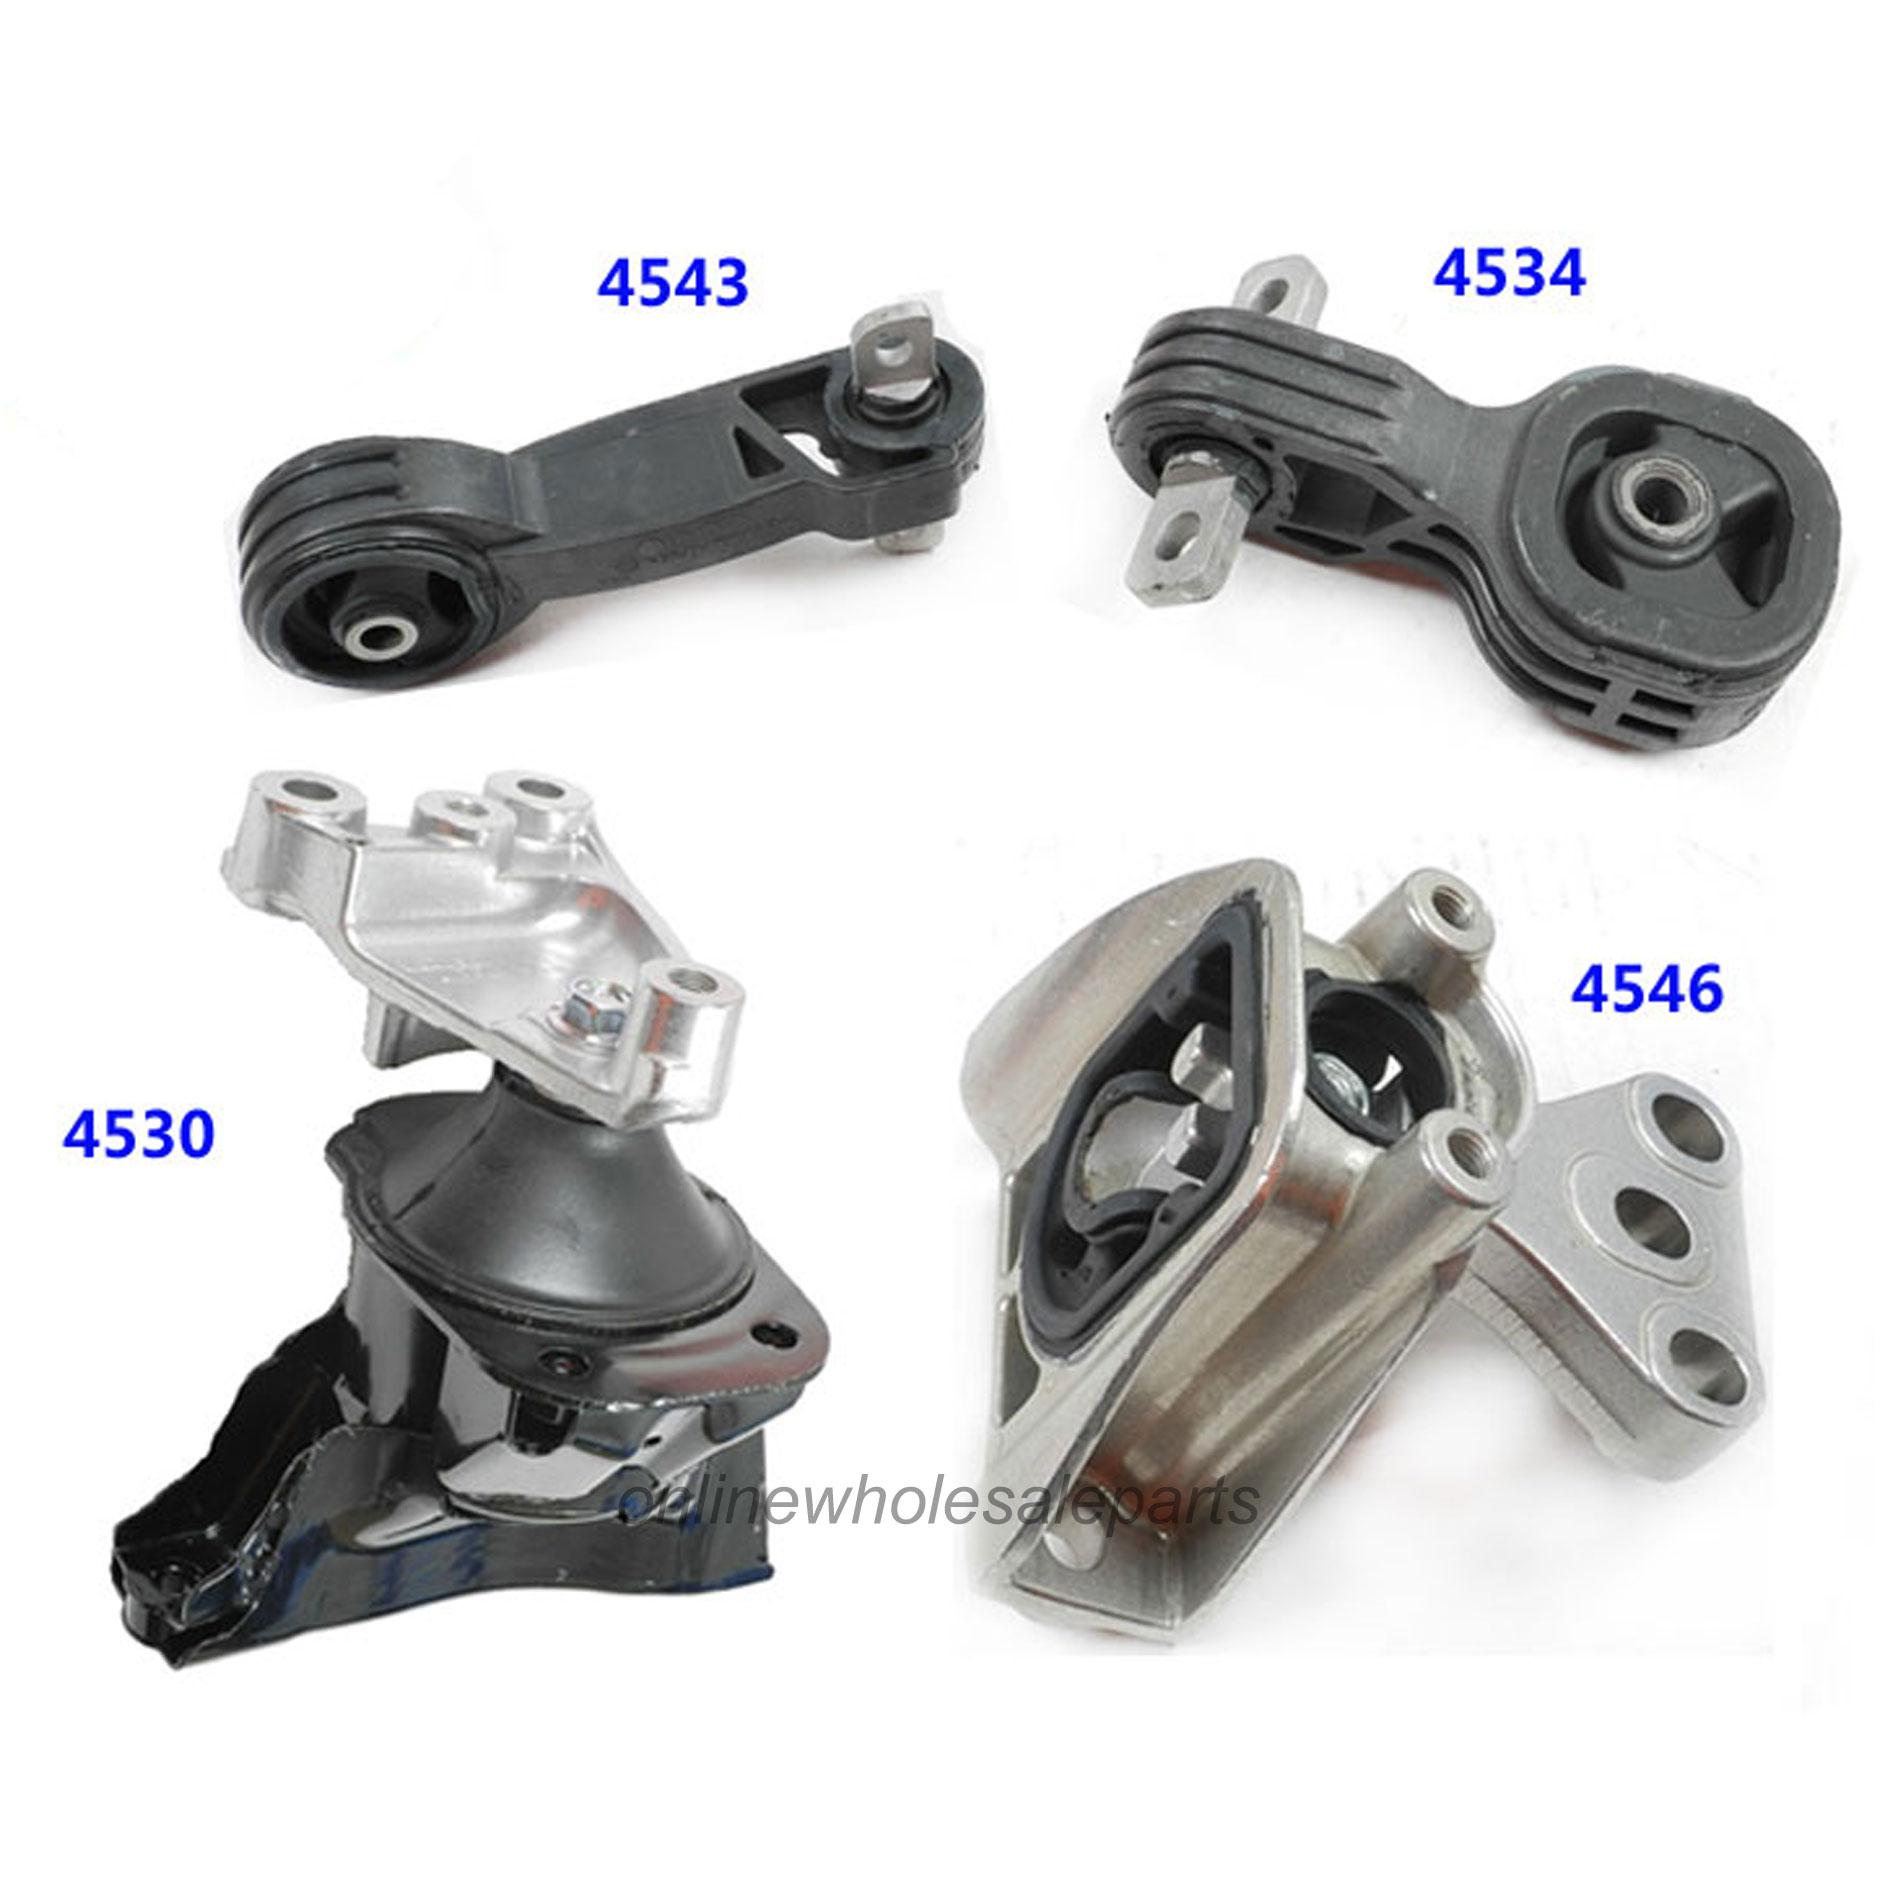 4543 FOR HONDA CIVIC 1.8L ENGINE MOTOR MOUNT NEW